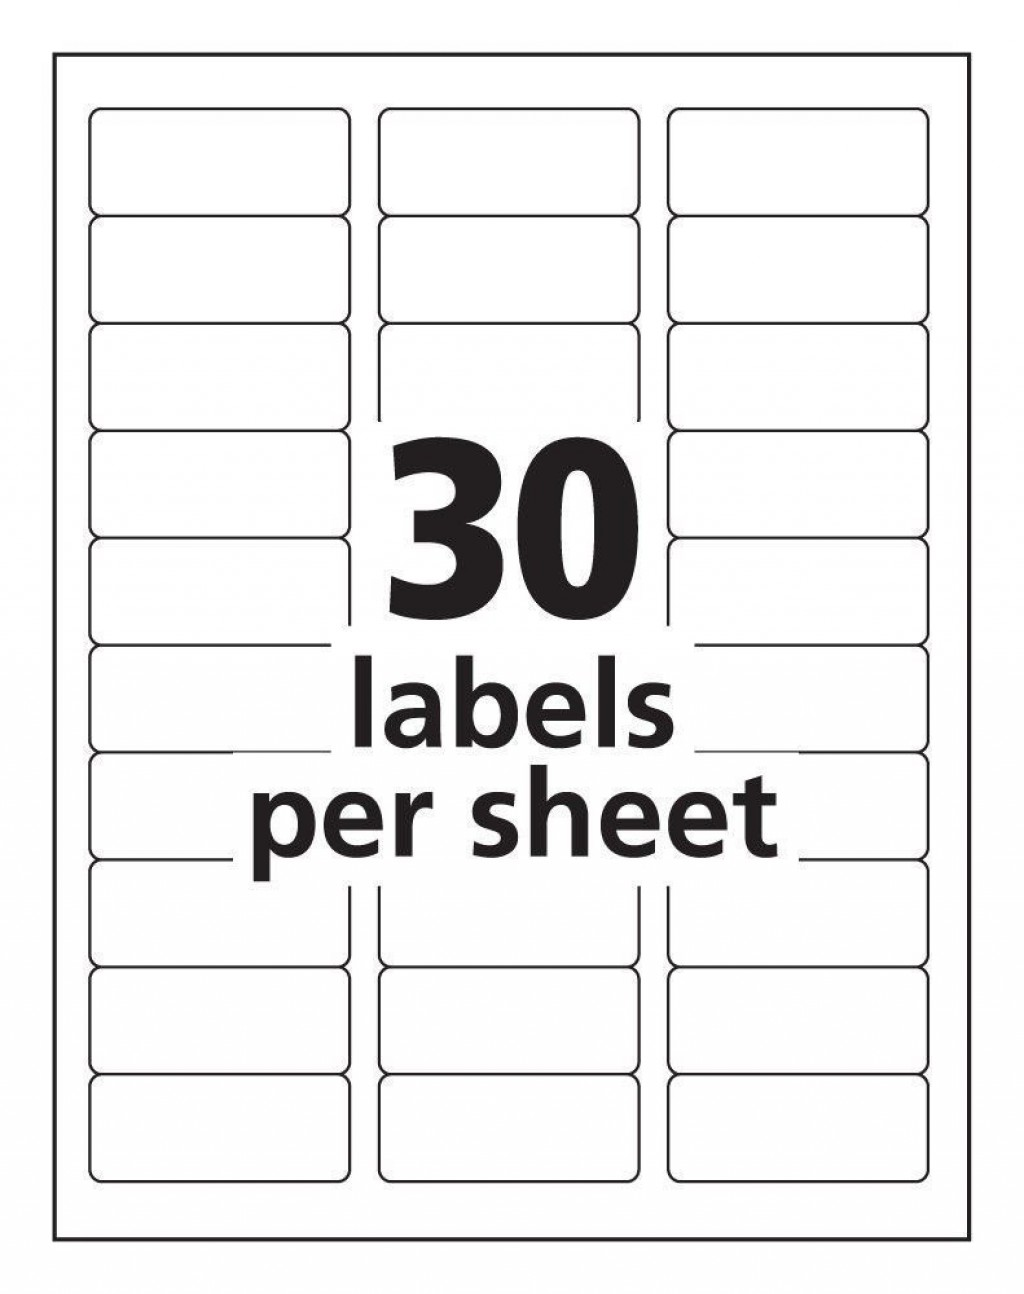 002 Fantastic Free Printable Addres Label Template Idea  Templates For Word 5160 16 Per Sheet ShippingLarge